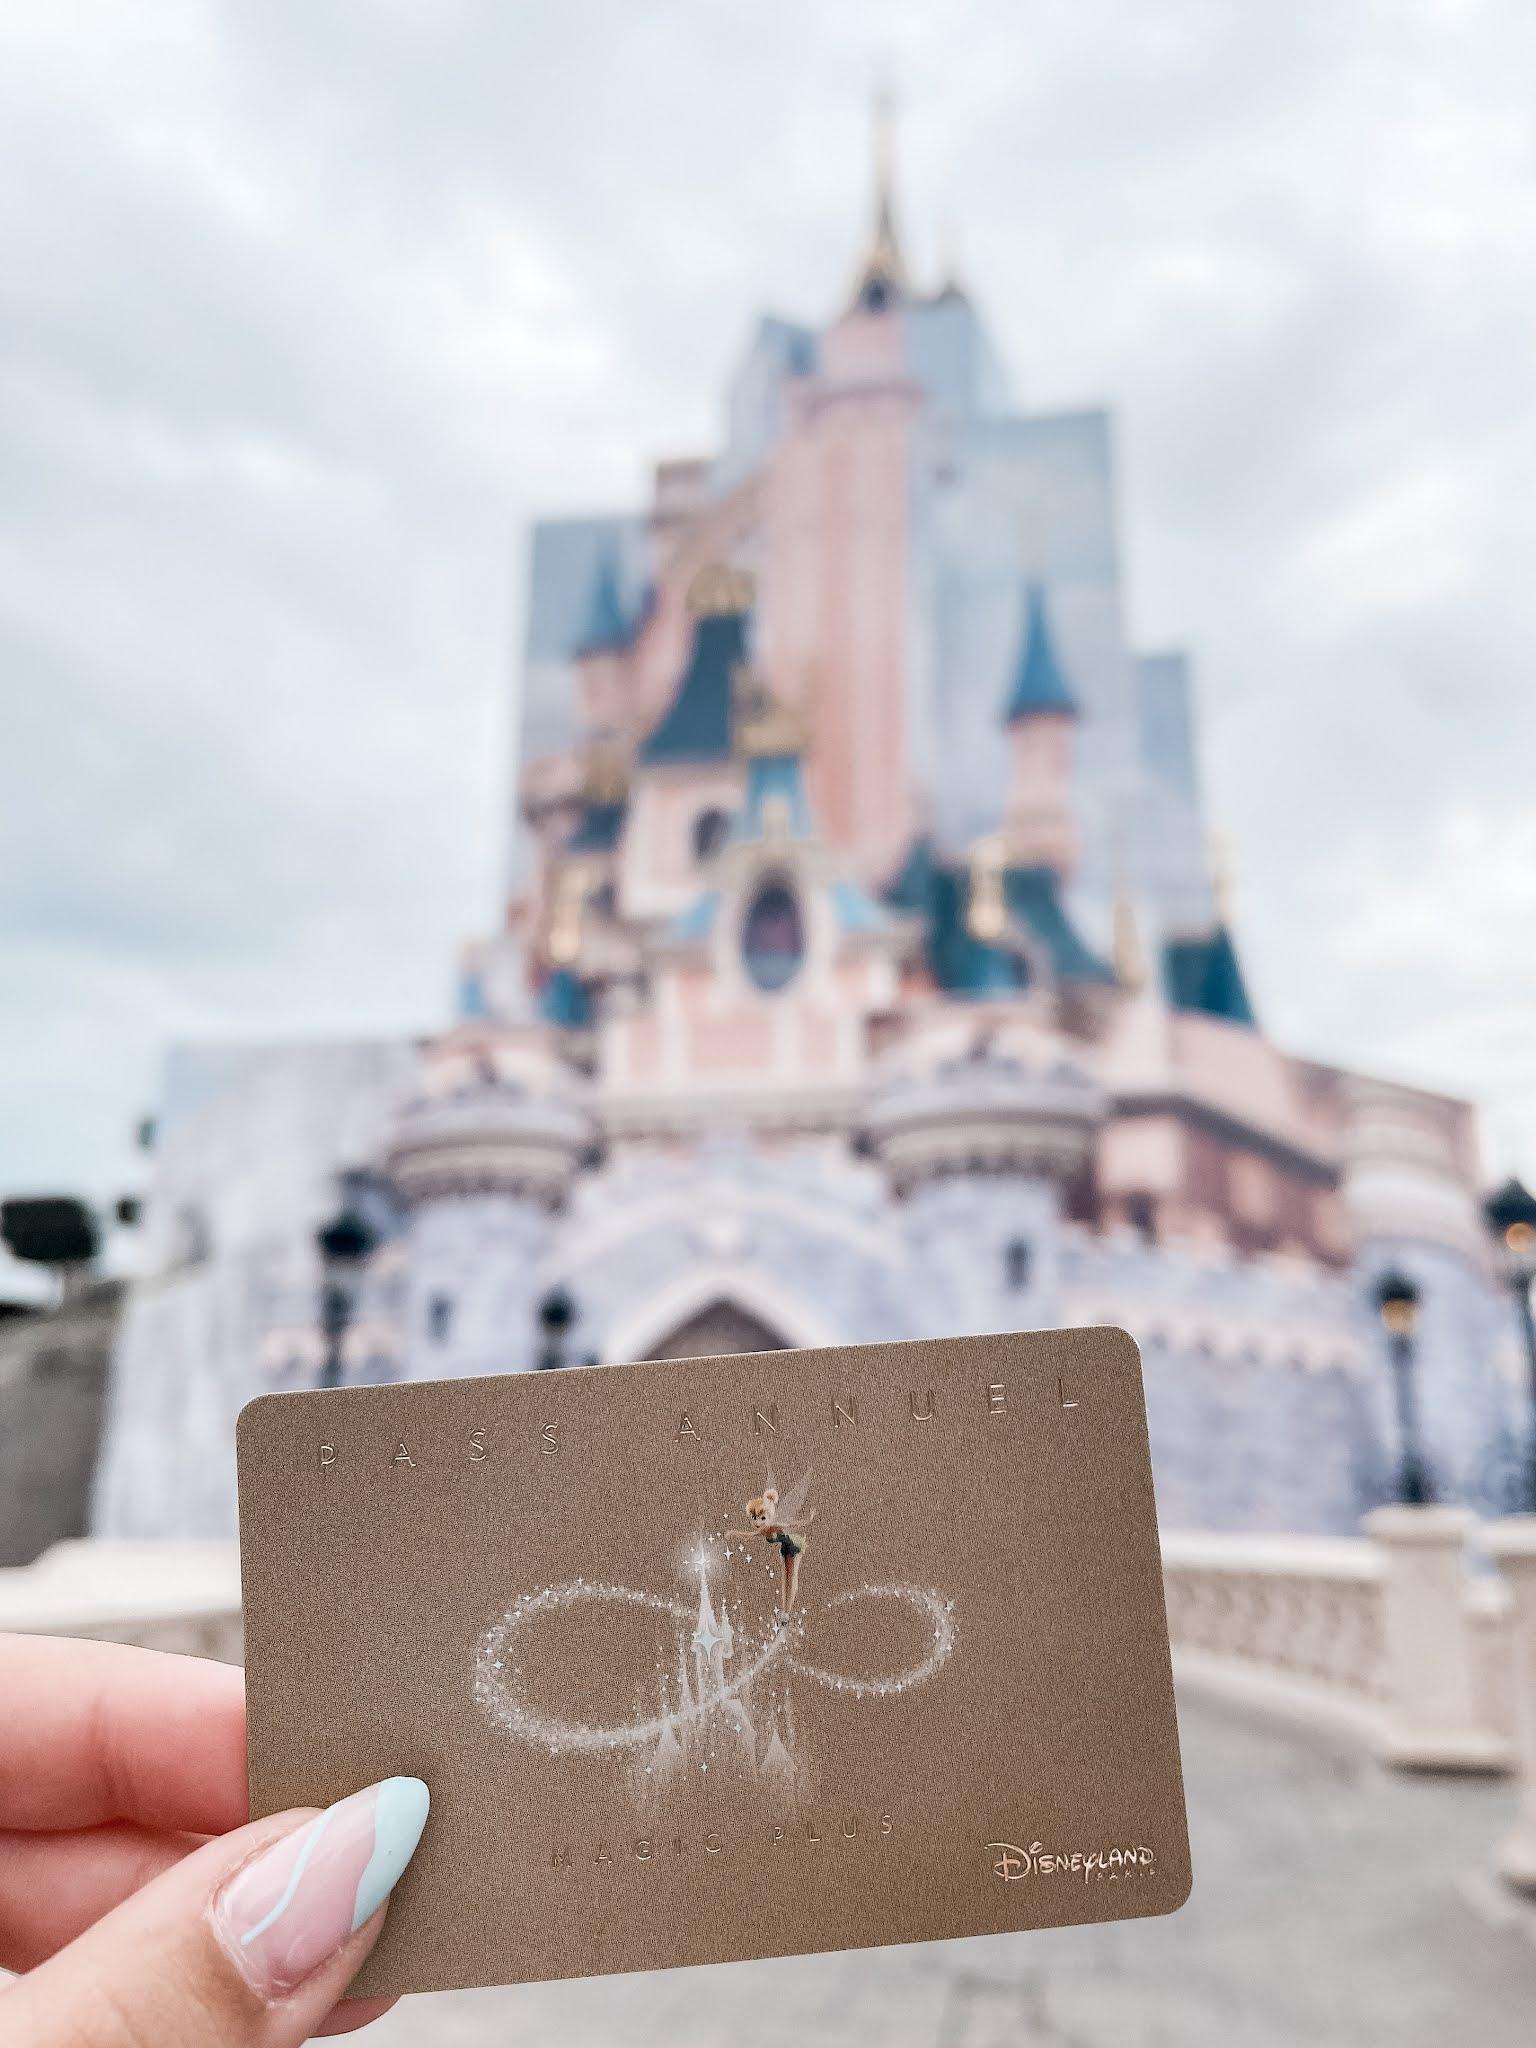 Pase Anual Magic Plus Disneyland Paris